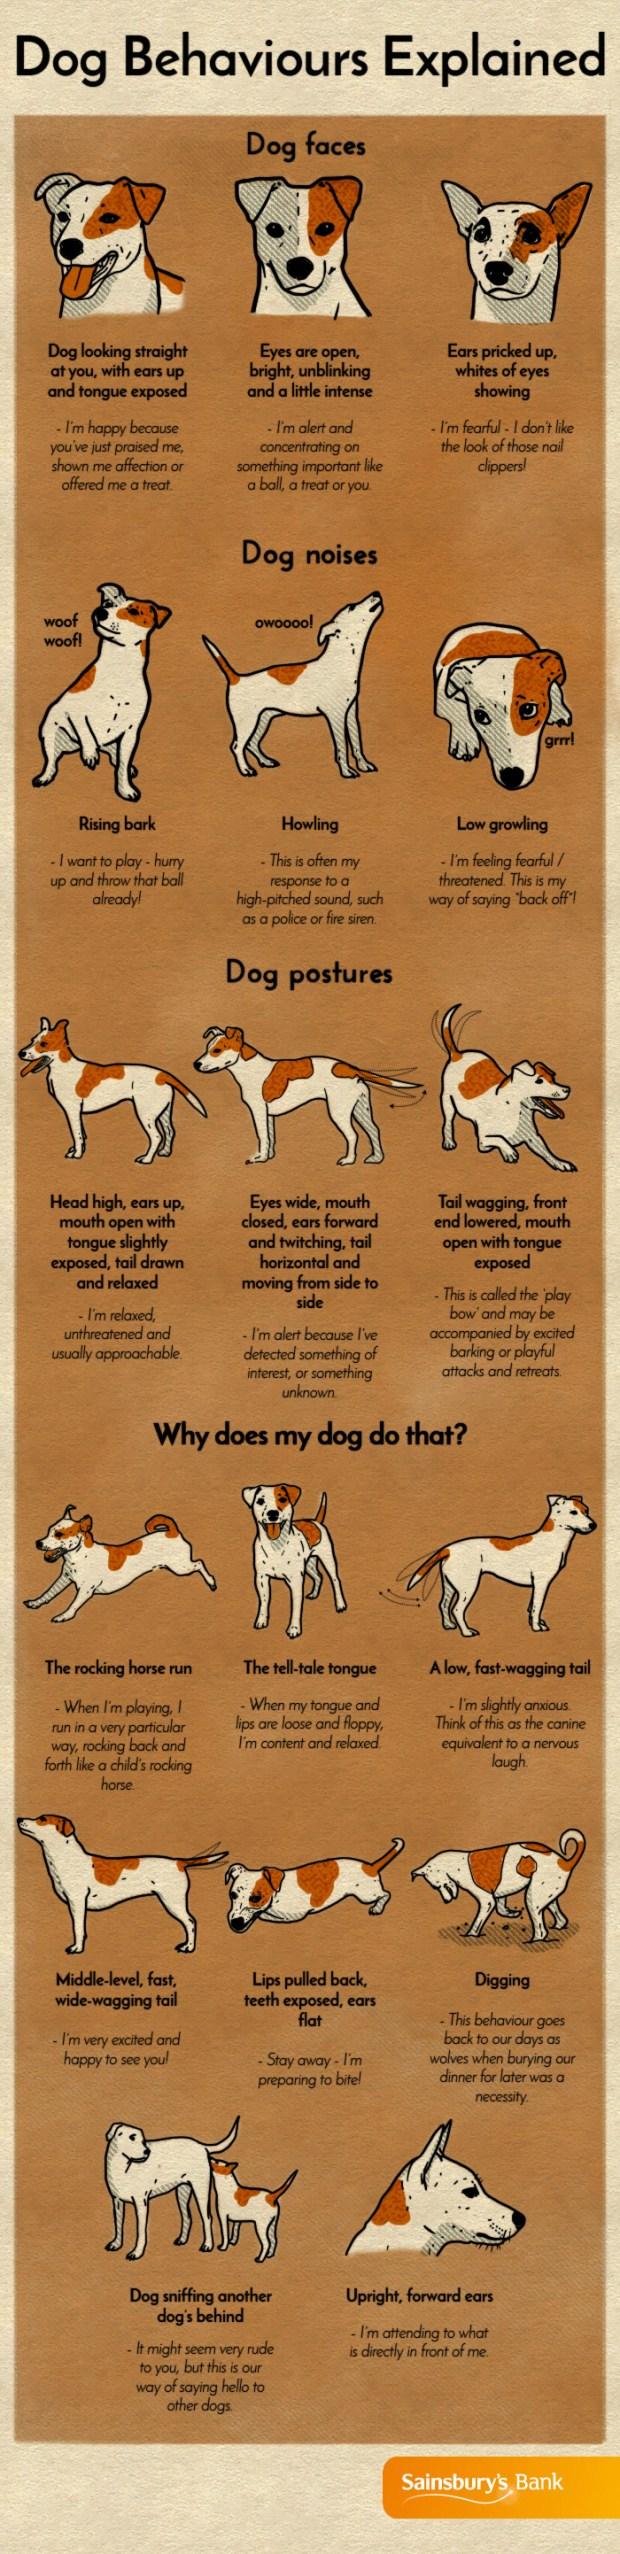 dog-behaviors-explained